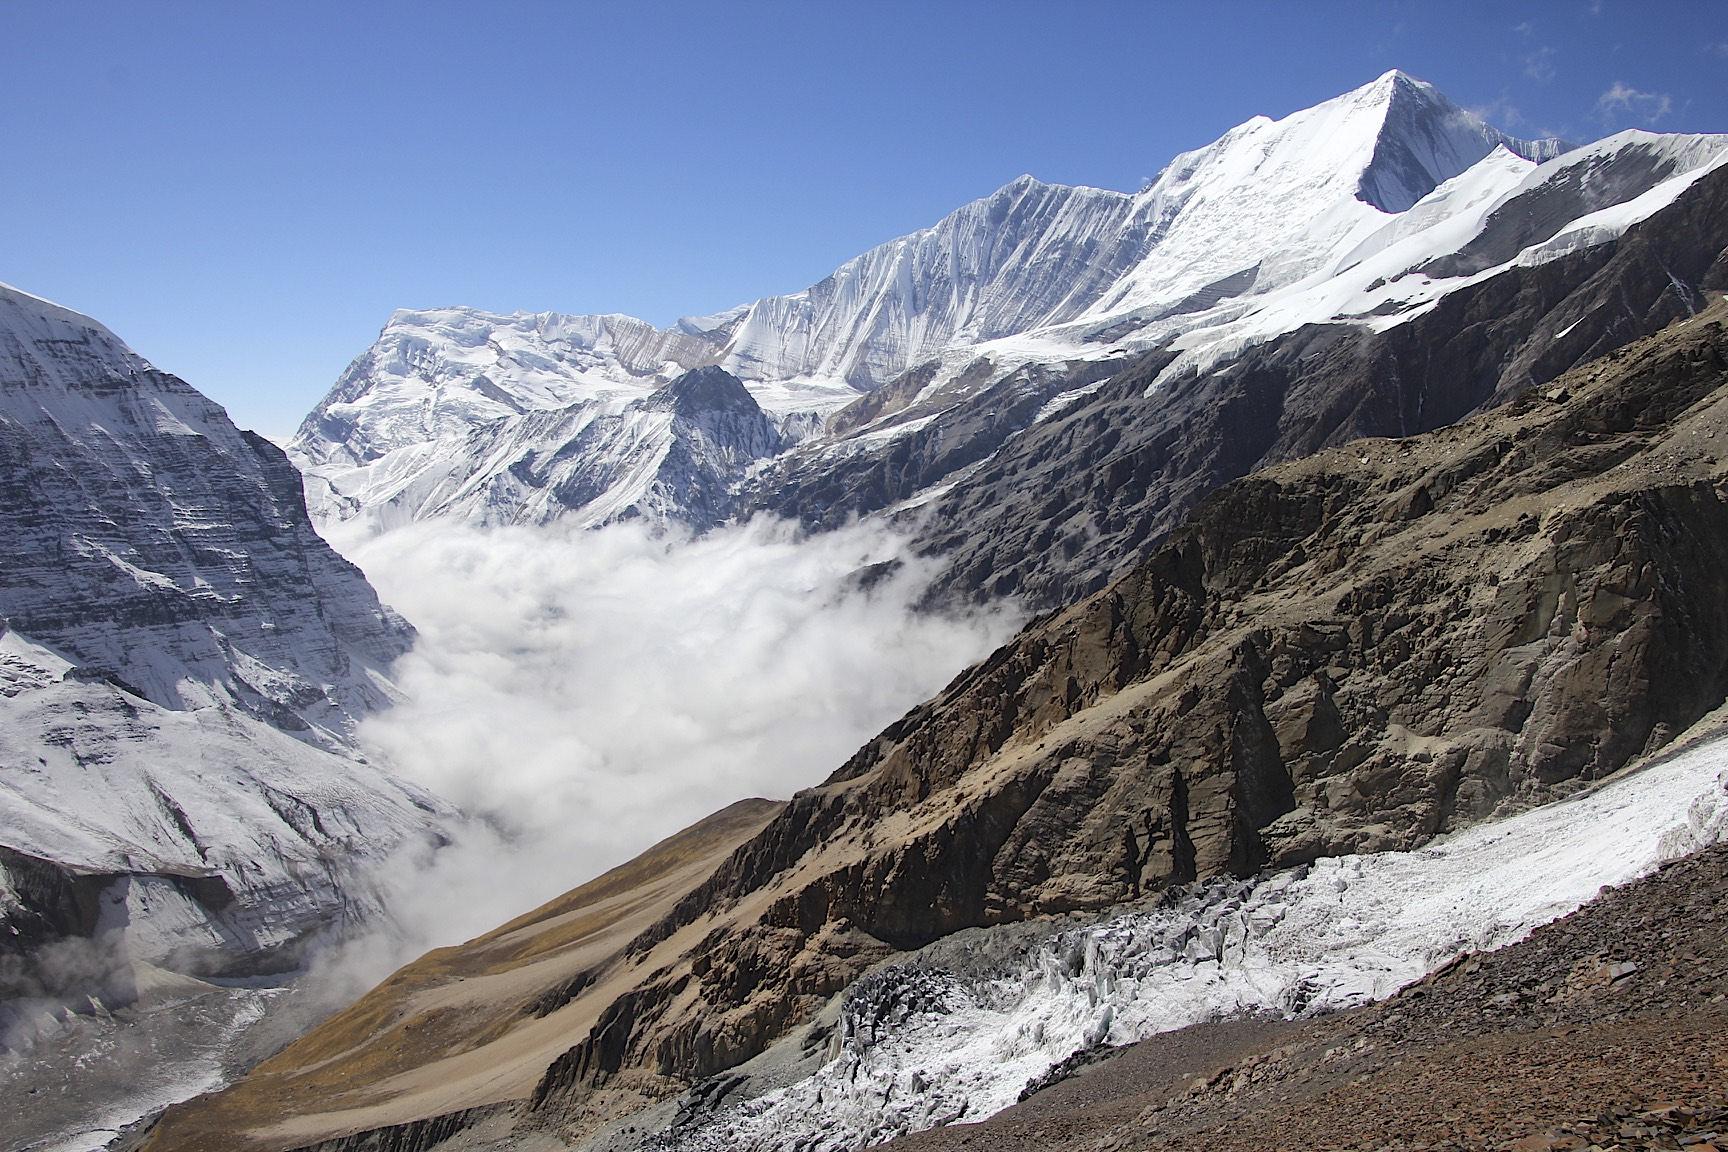 The view to Dhaulagiri II.